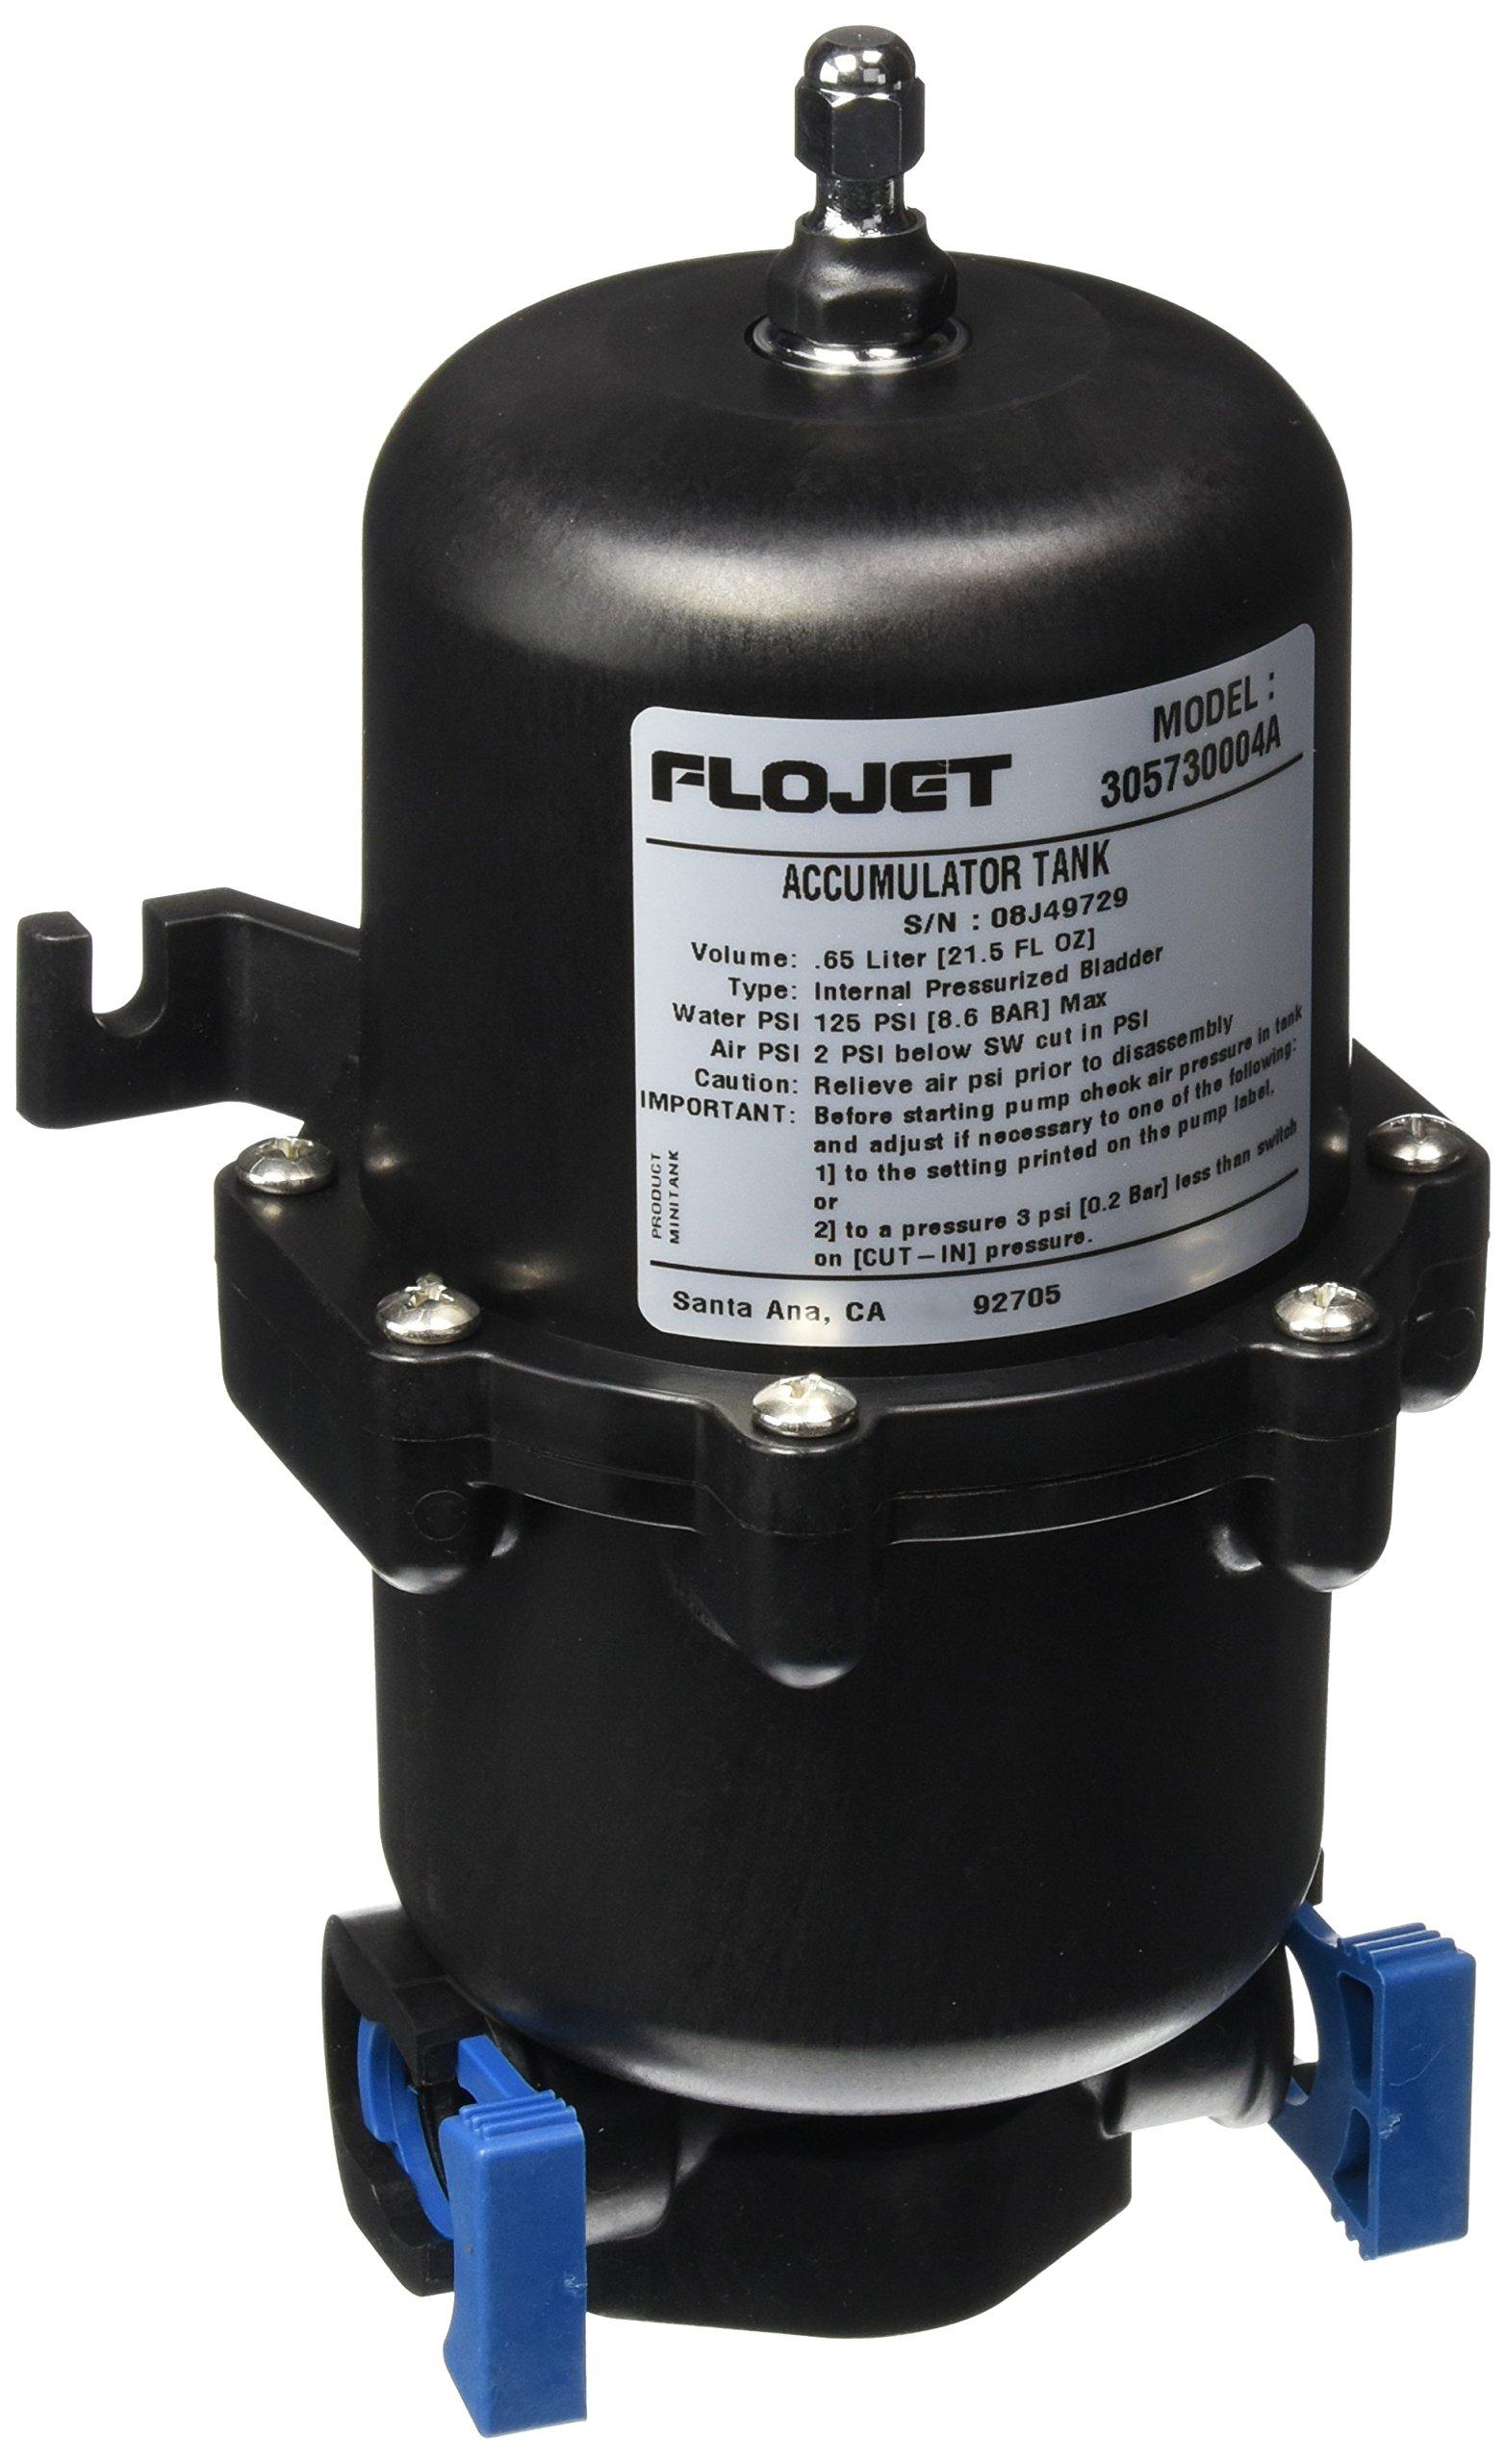 Flojet 305730004A Accumulator Tank